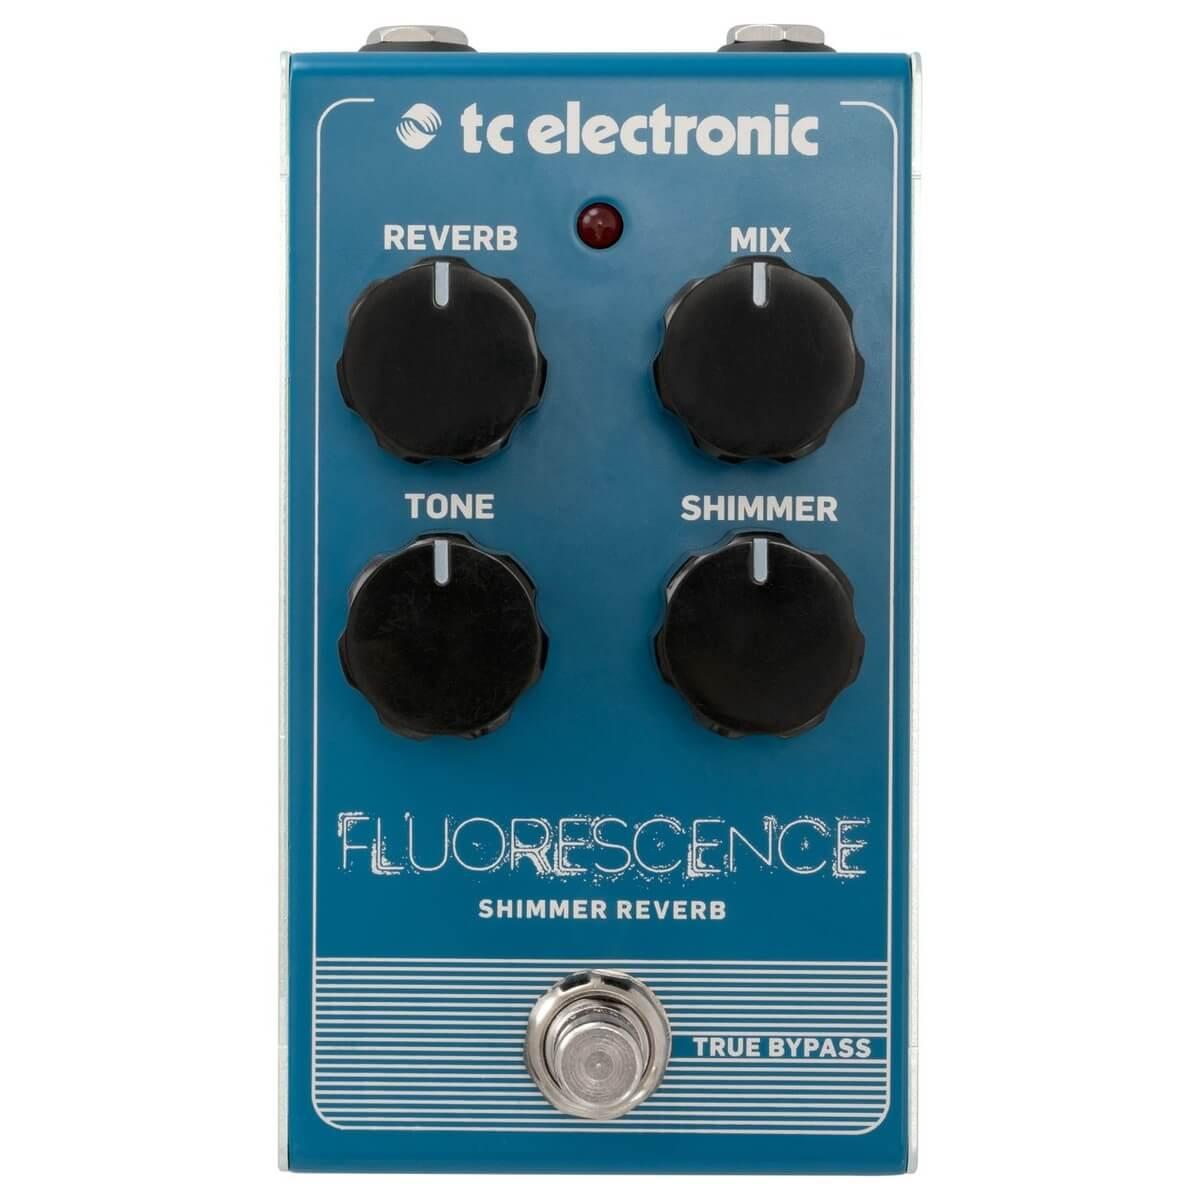 TC Electronic Fluorescence Shimmer Reverb guitar-effekt-pedal